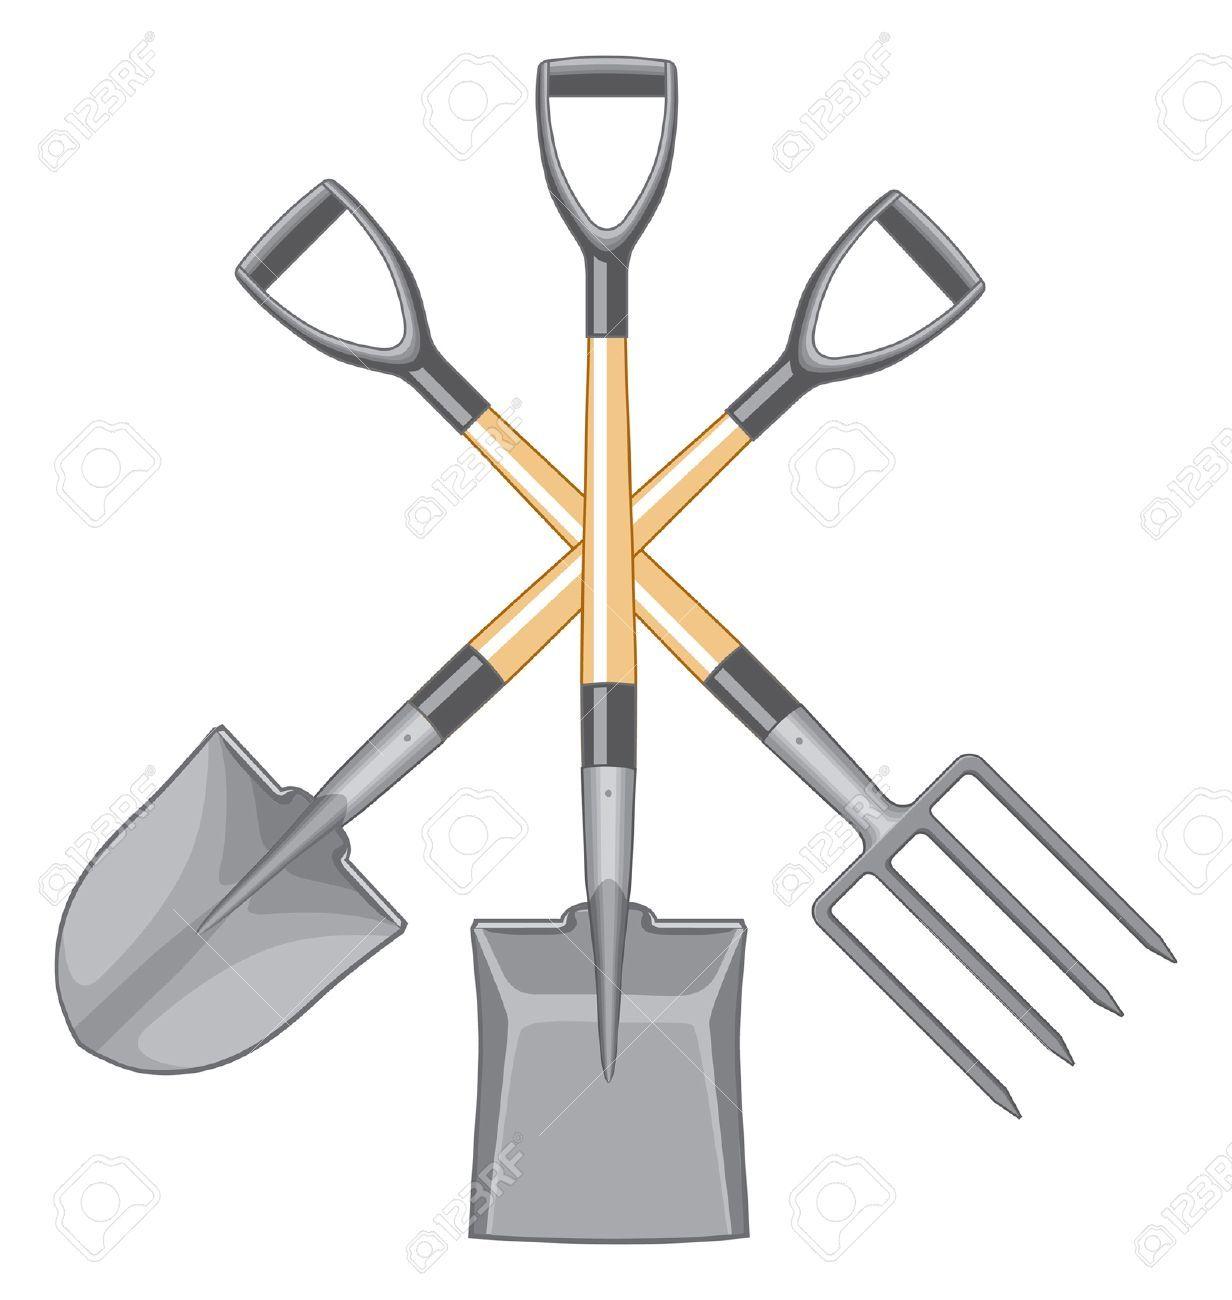 pitchfork garden tool clip art Google Search Garden